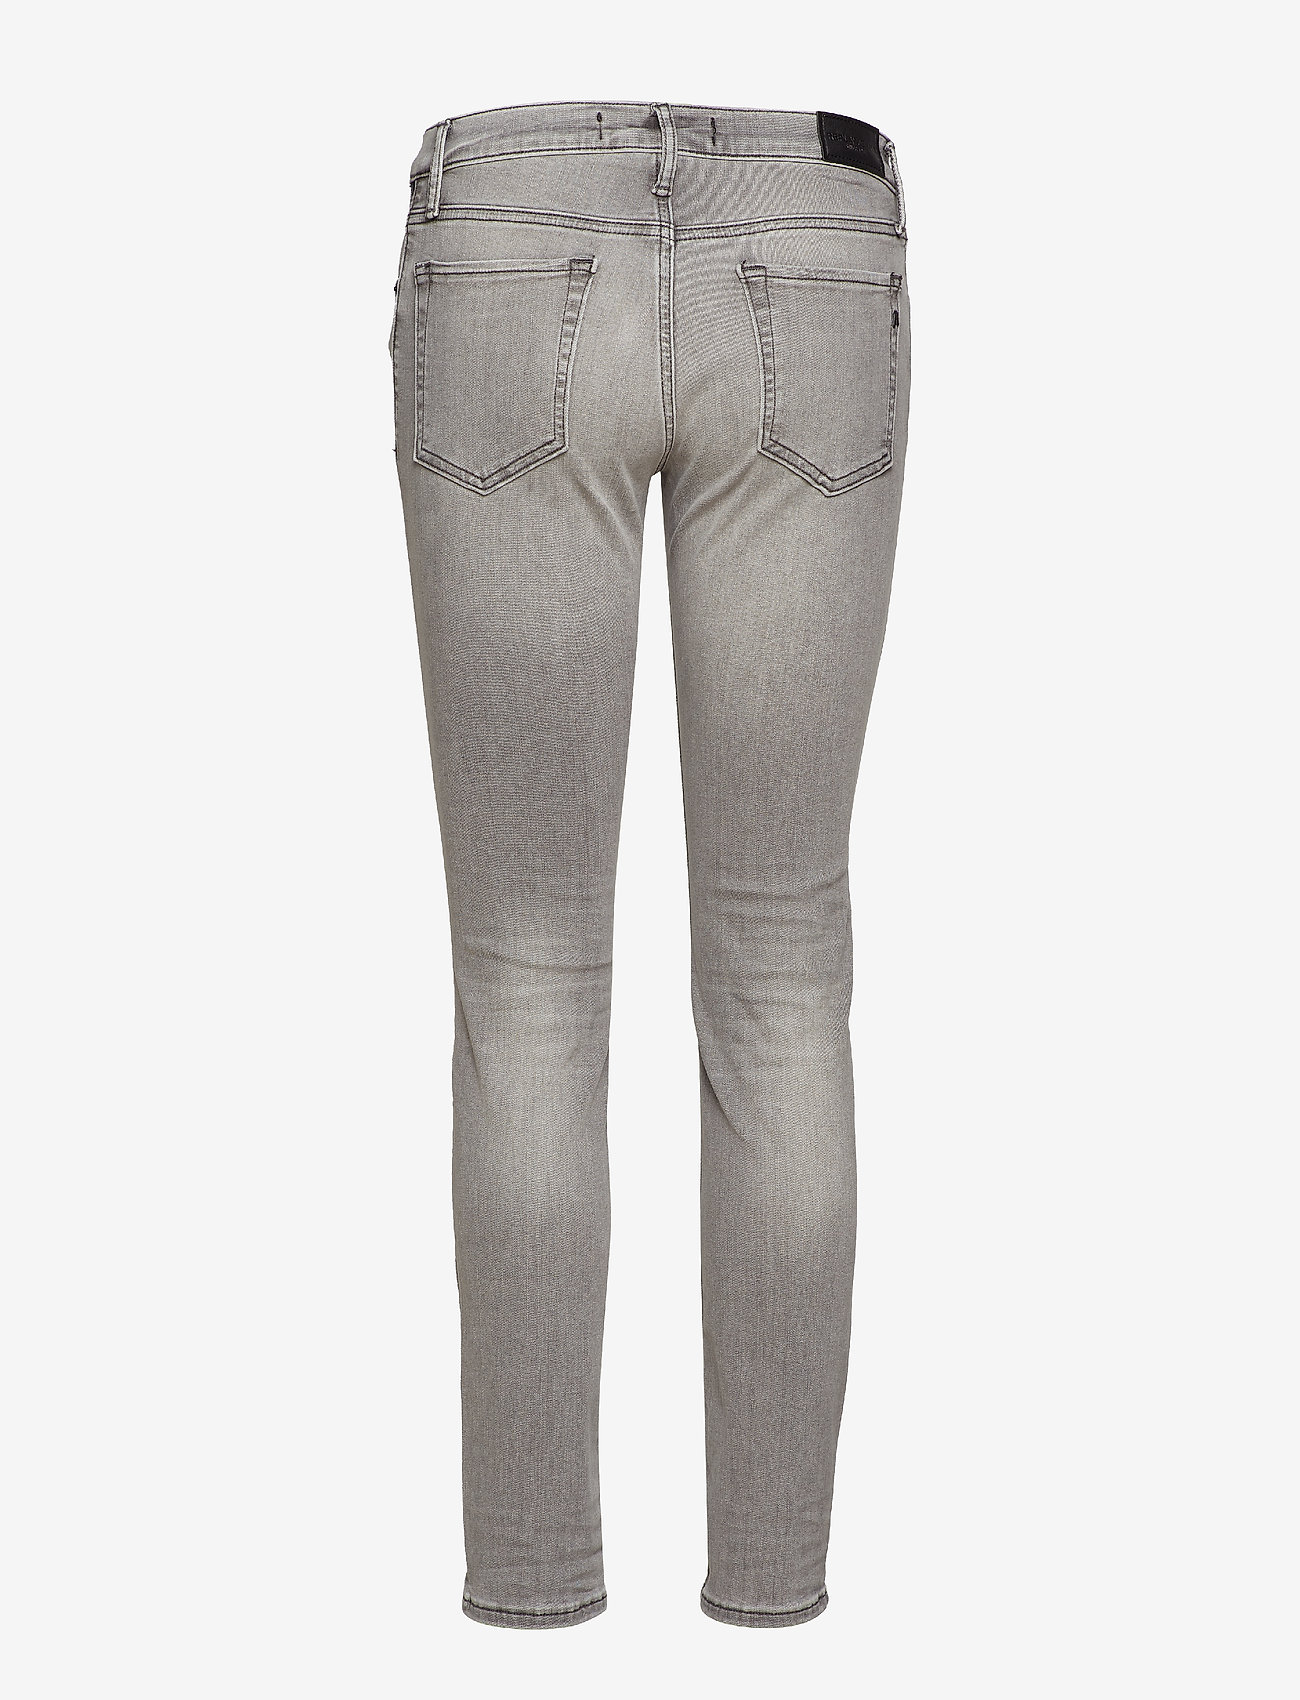 Replay - VIVY - slim jeans - grey